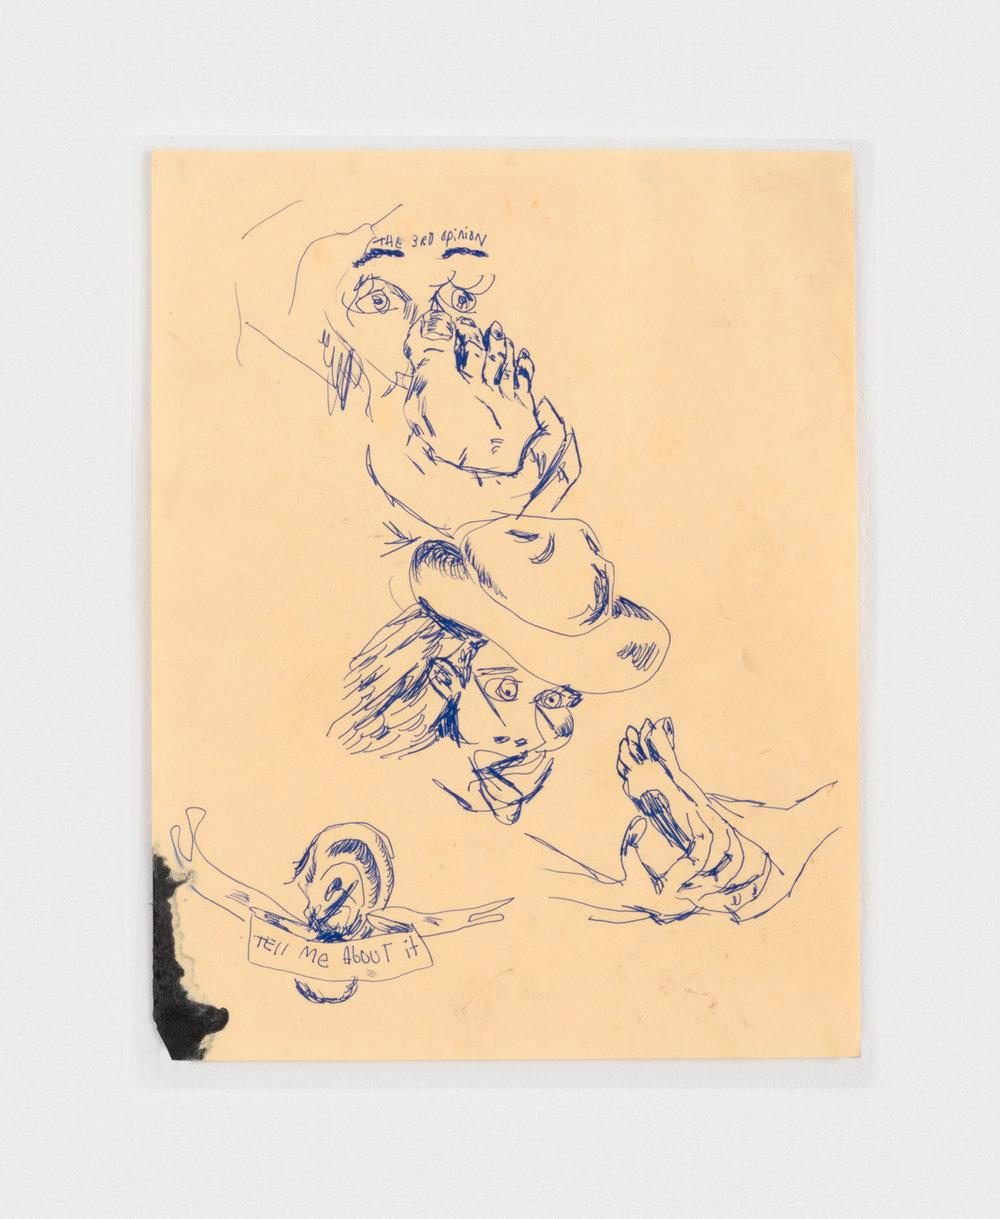 Alex Becerra  Foot Rub  2016 Ink on paper (laminated) 11h x 8 ½w in AB156